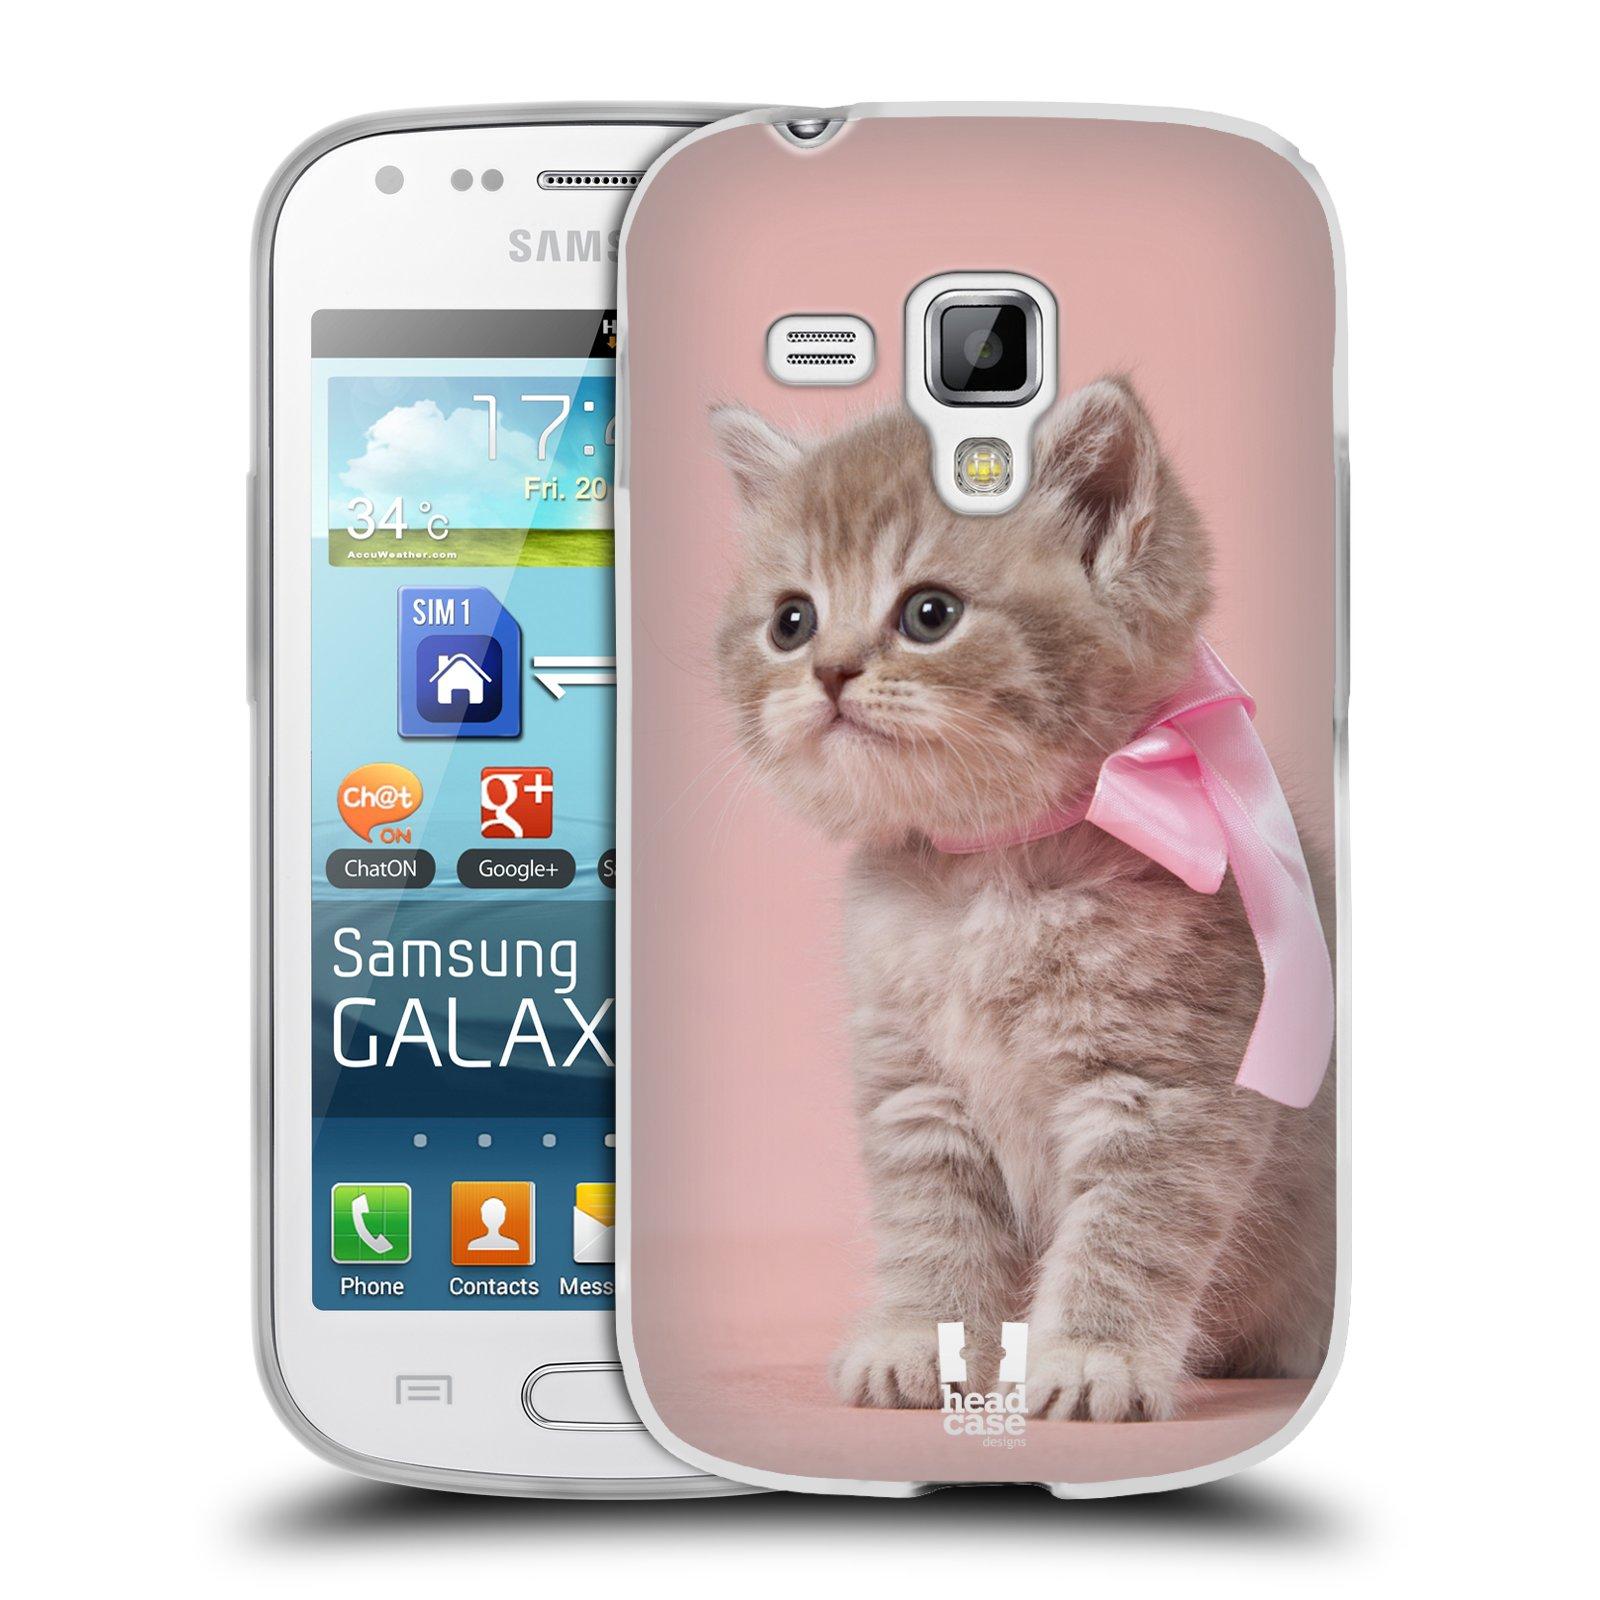 Silikonové pouzdro na mobil Samsung Galaxy Trend Plus HEAD CASE KOTĚ S MAŠLÍ (Silikonový kryt či obal na mobilní telefon Samsung Galaxy Trend Plus GT-S7580)